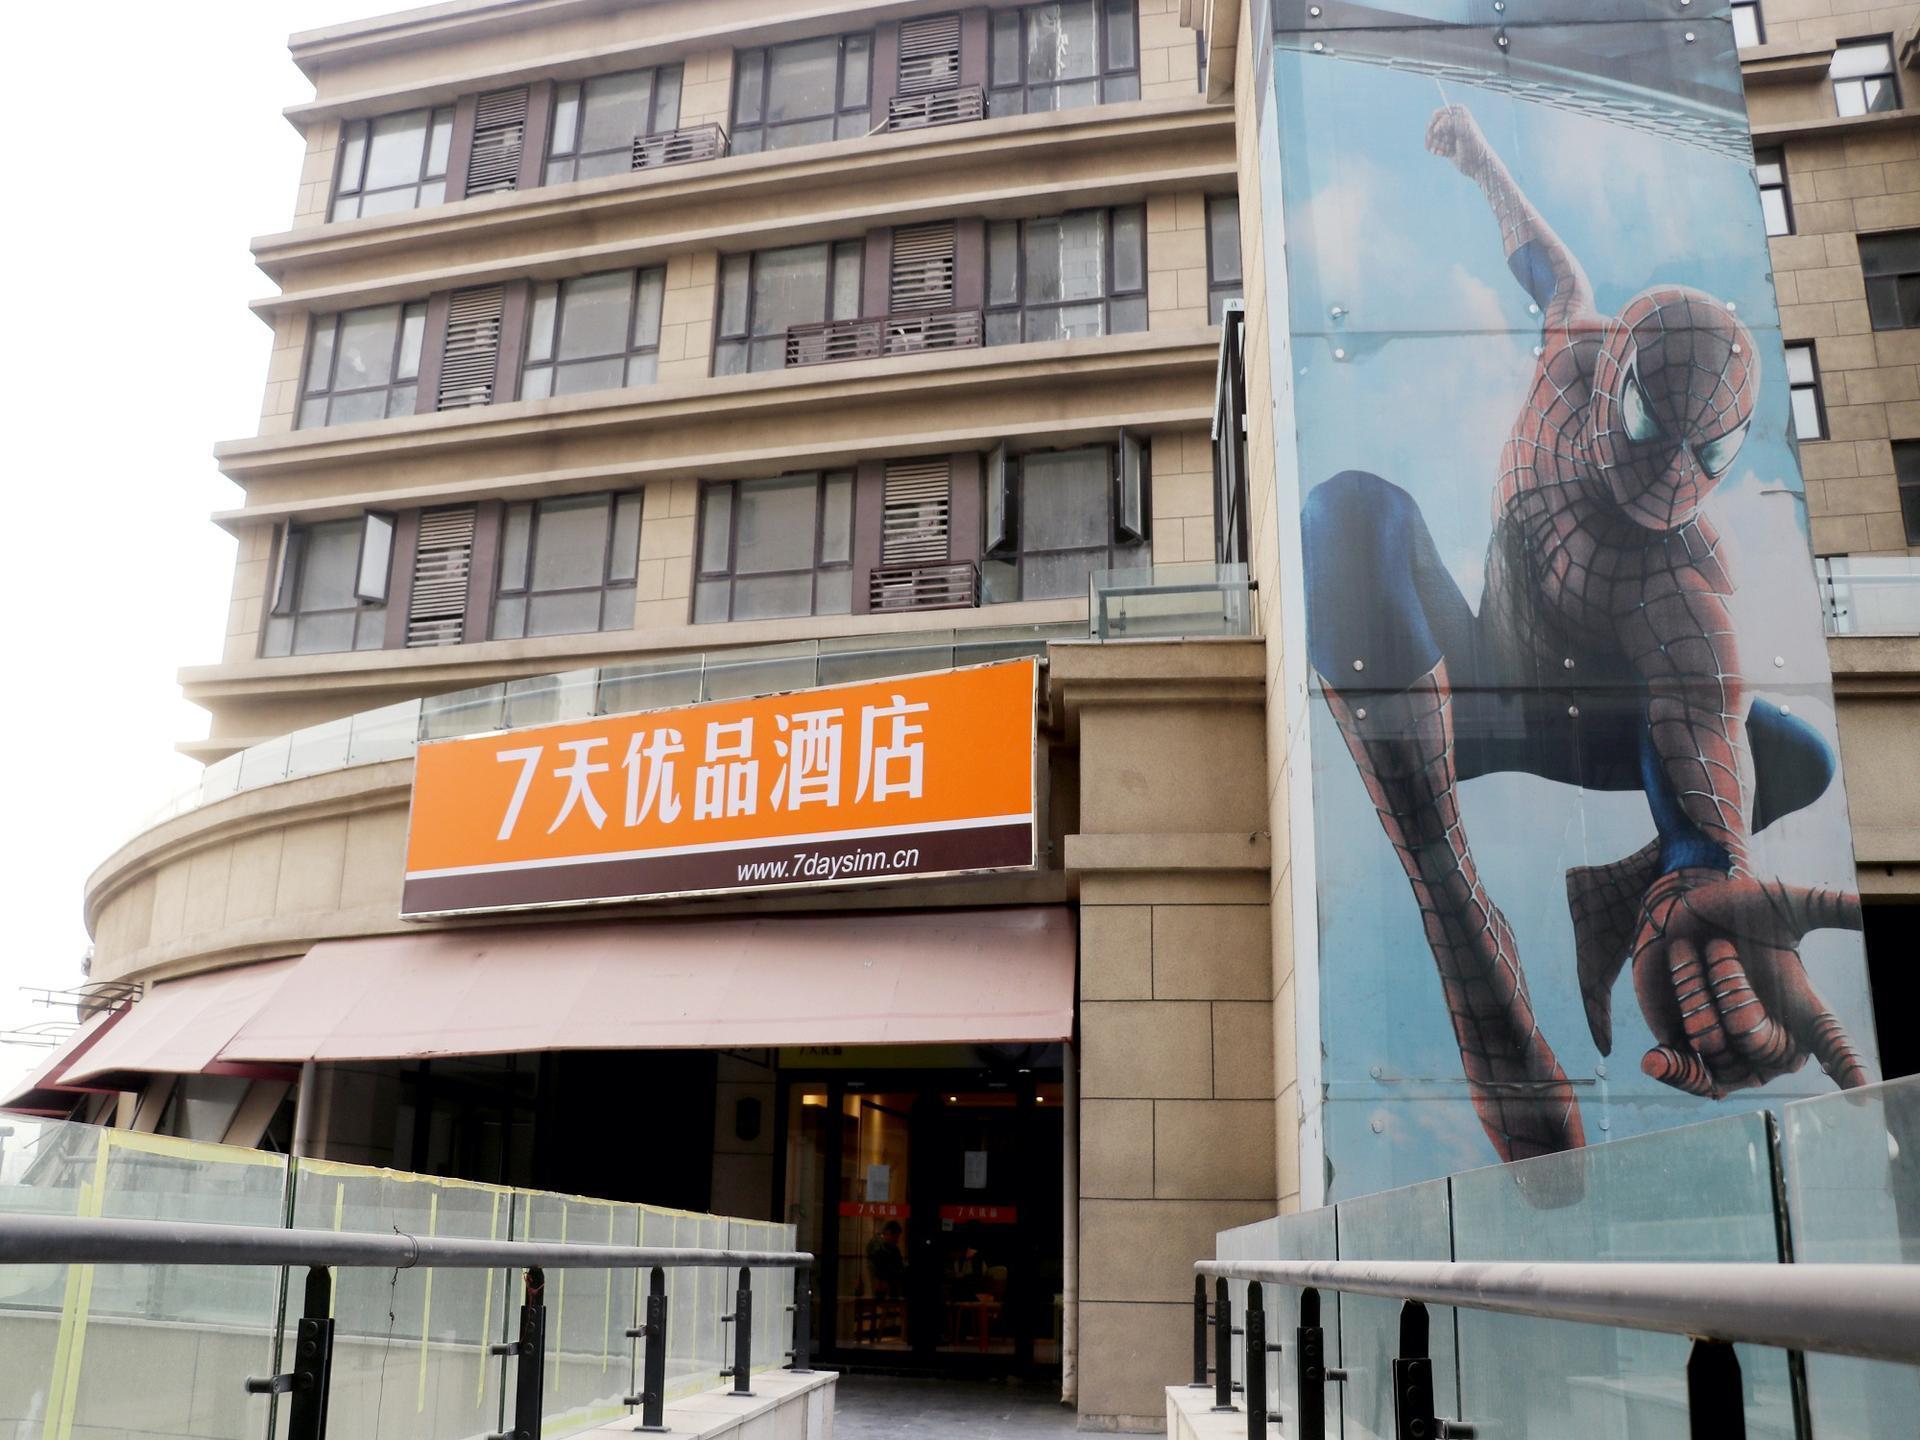 7 Days PremiumJinan West Station